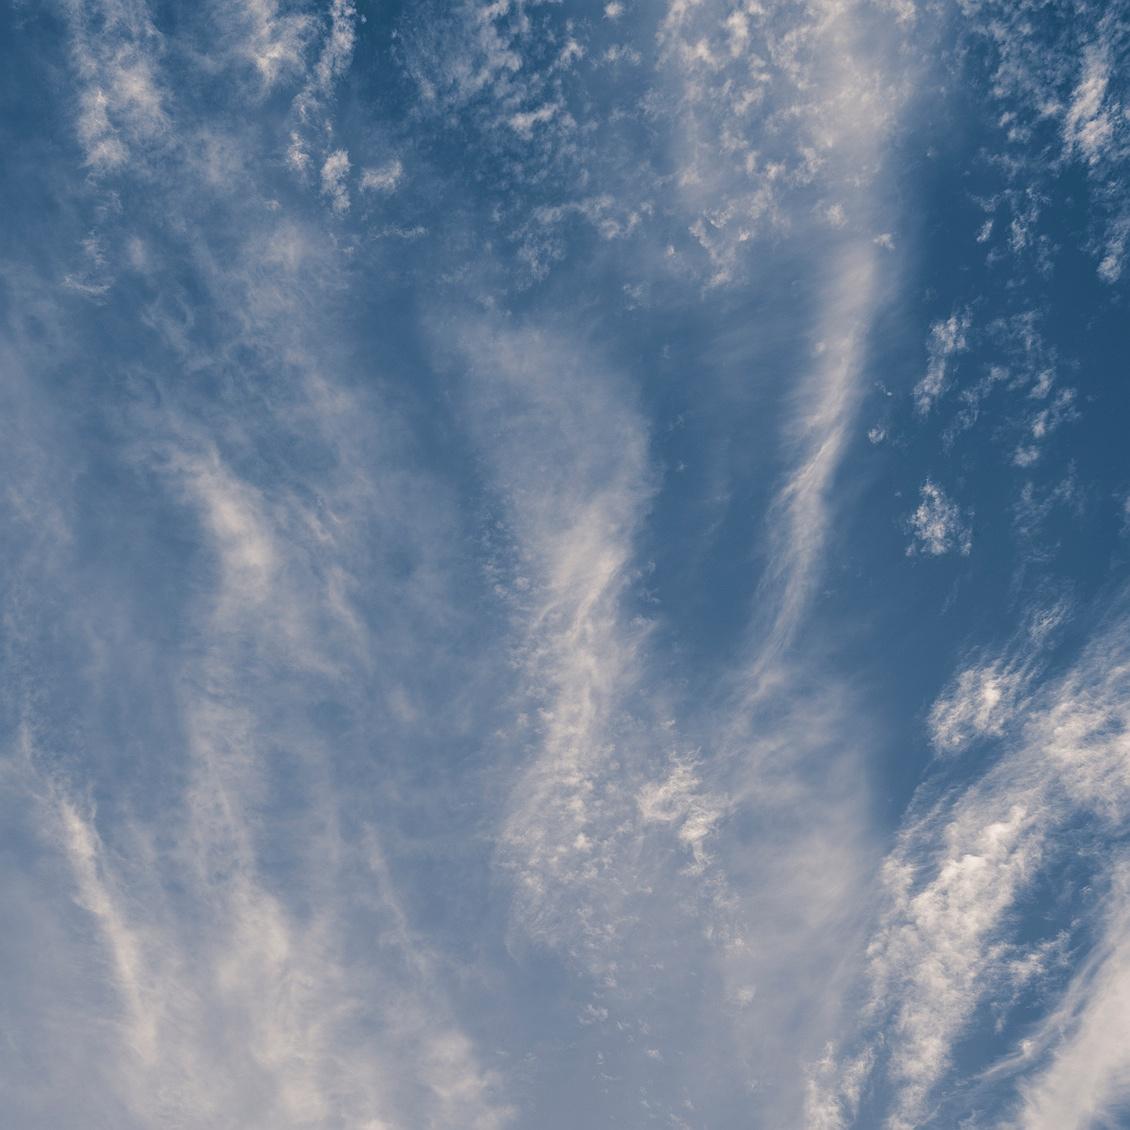 09_sky_clouds